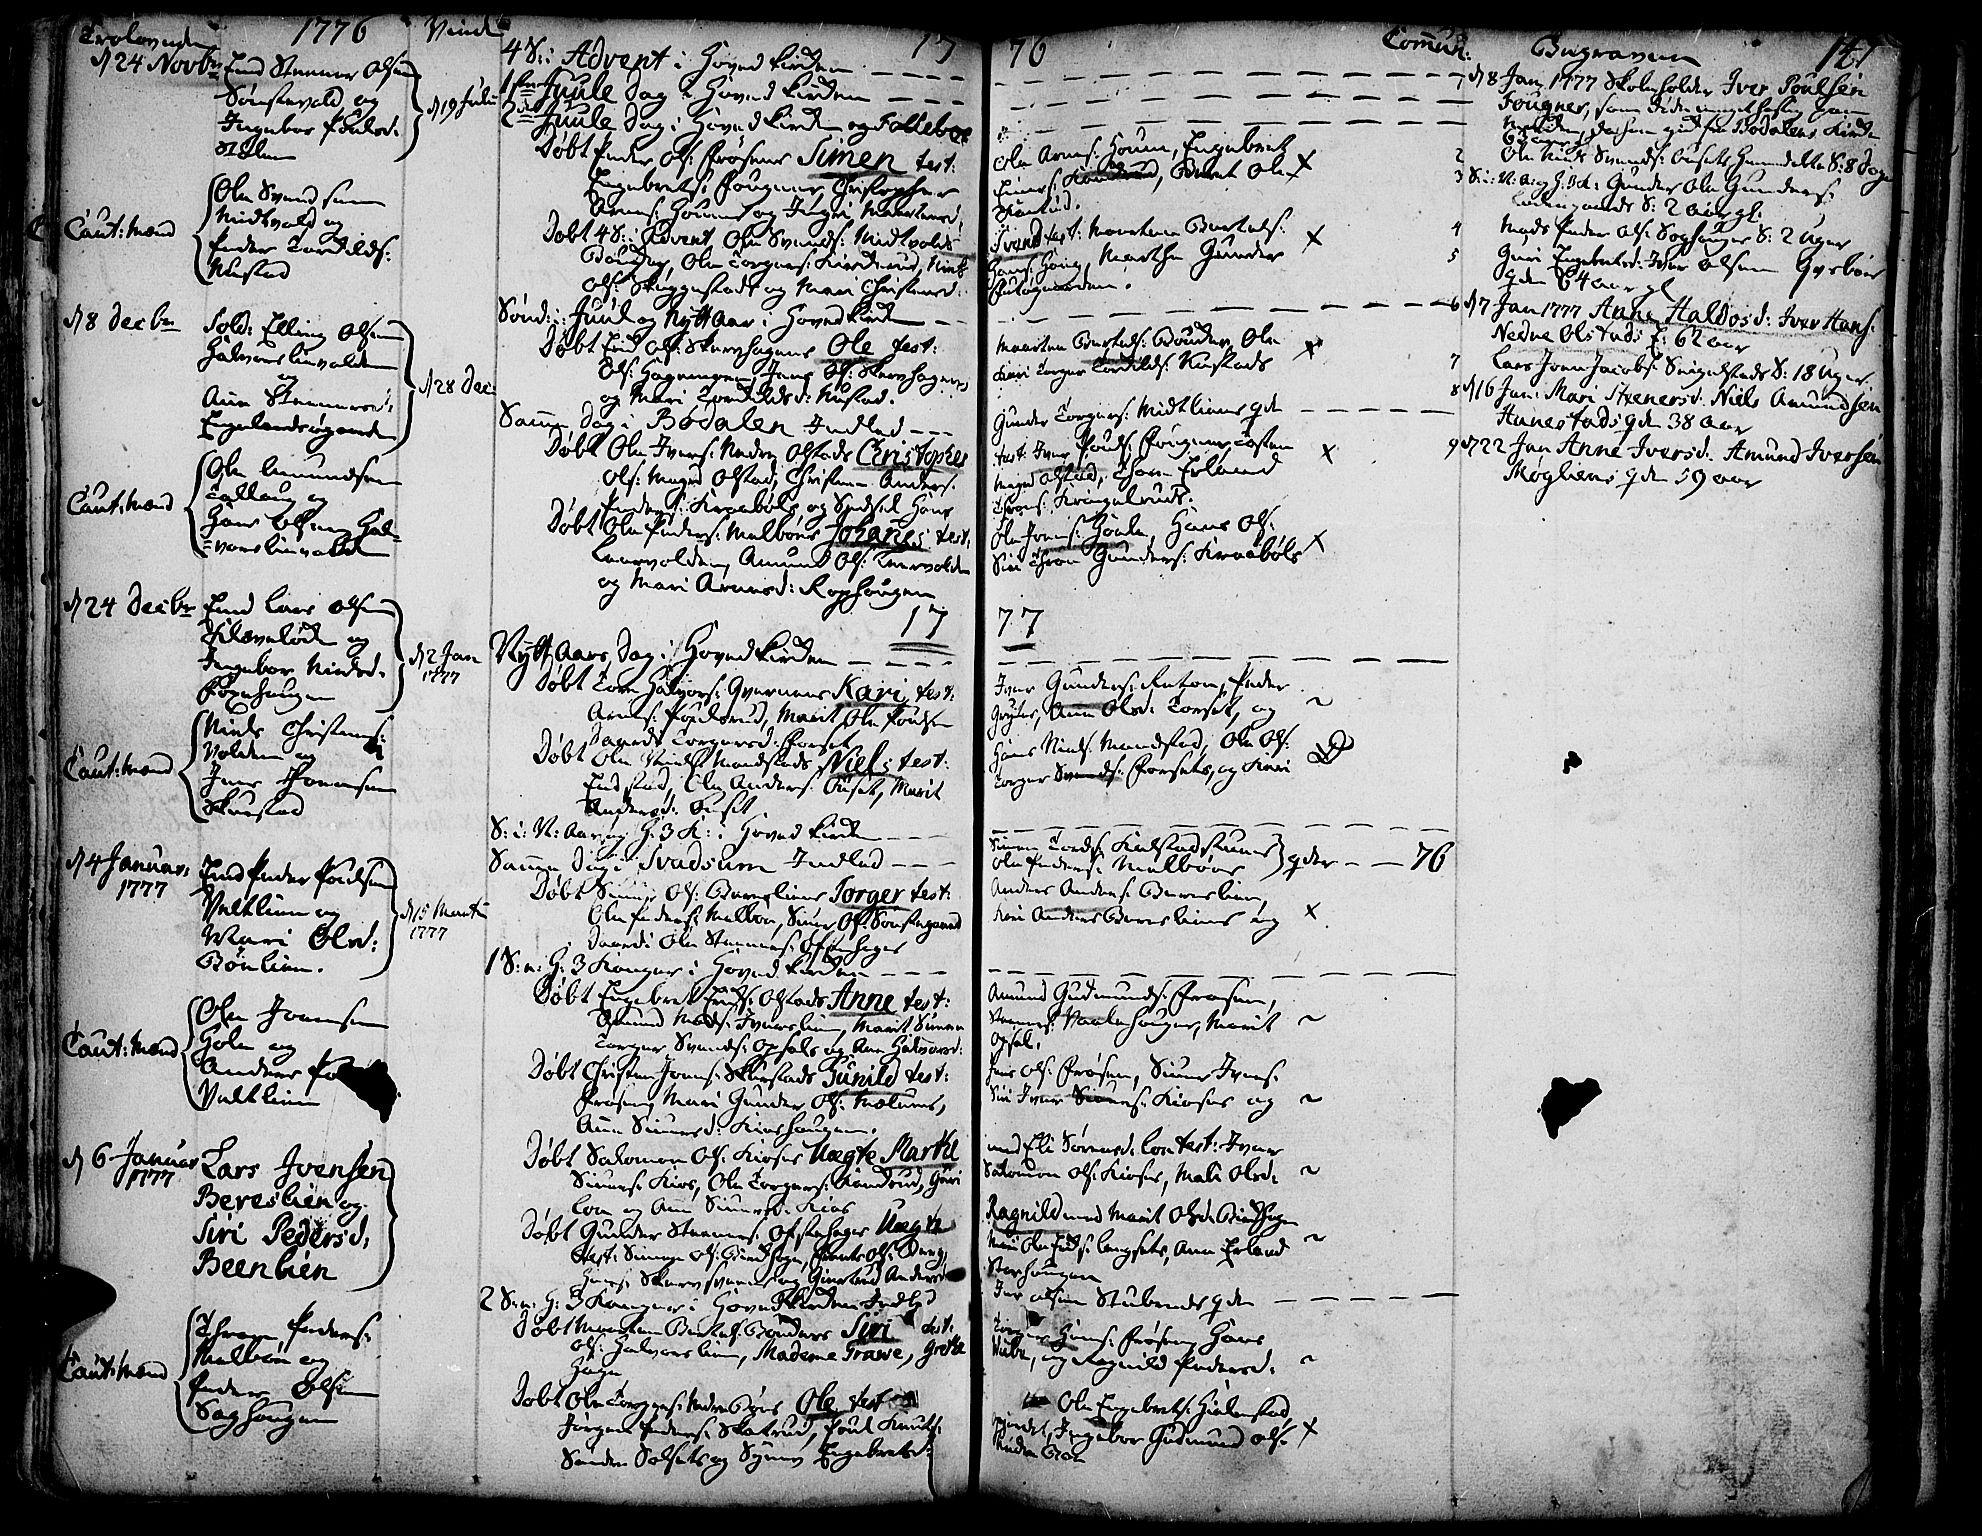 SAH, Gausdal prestekontor, Ministerialbok nr. 3, 1758-1809, s. 147